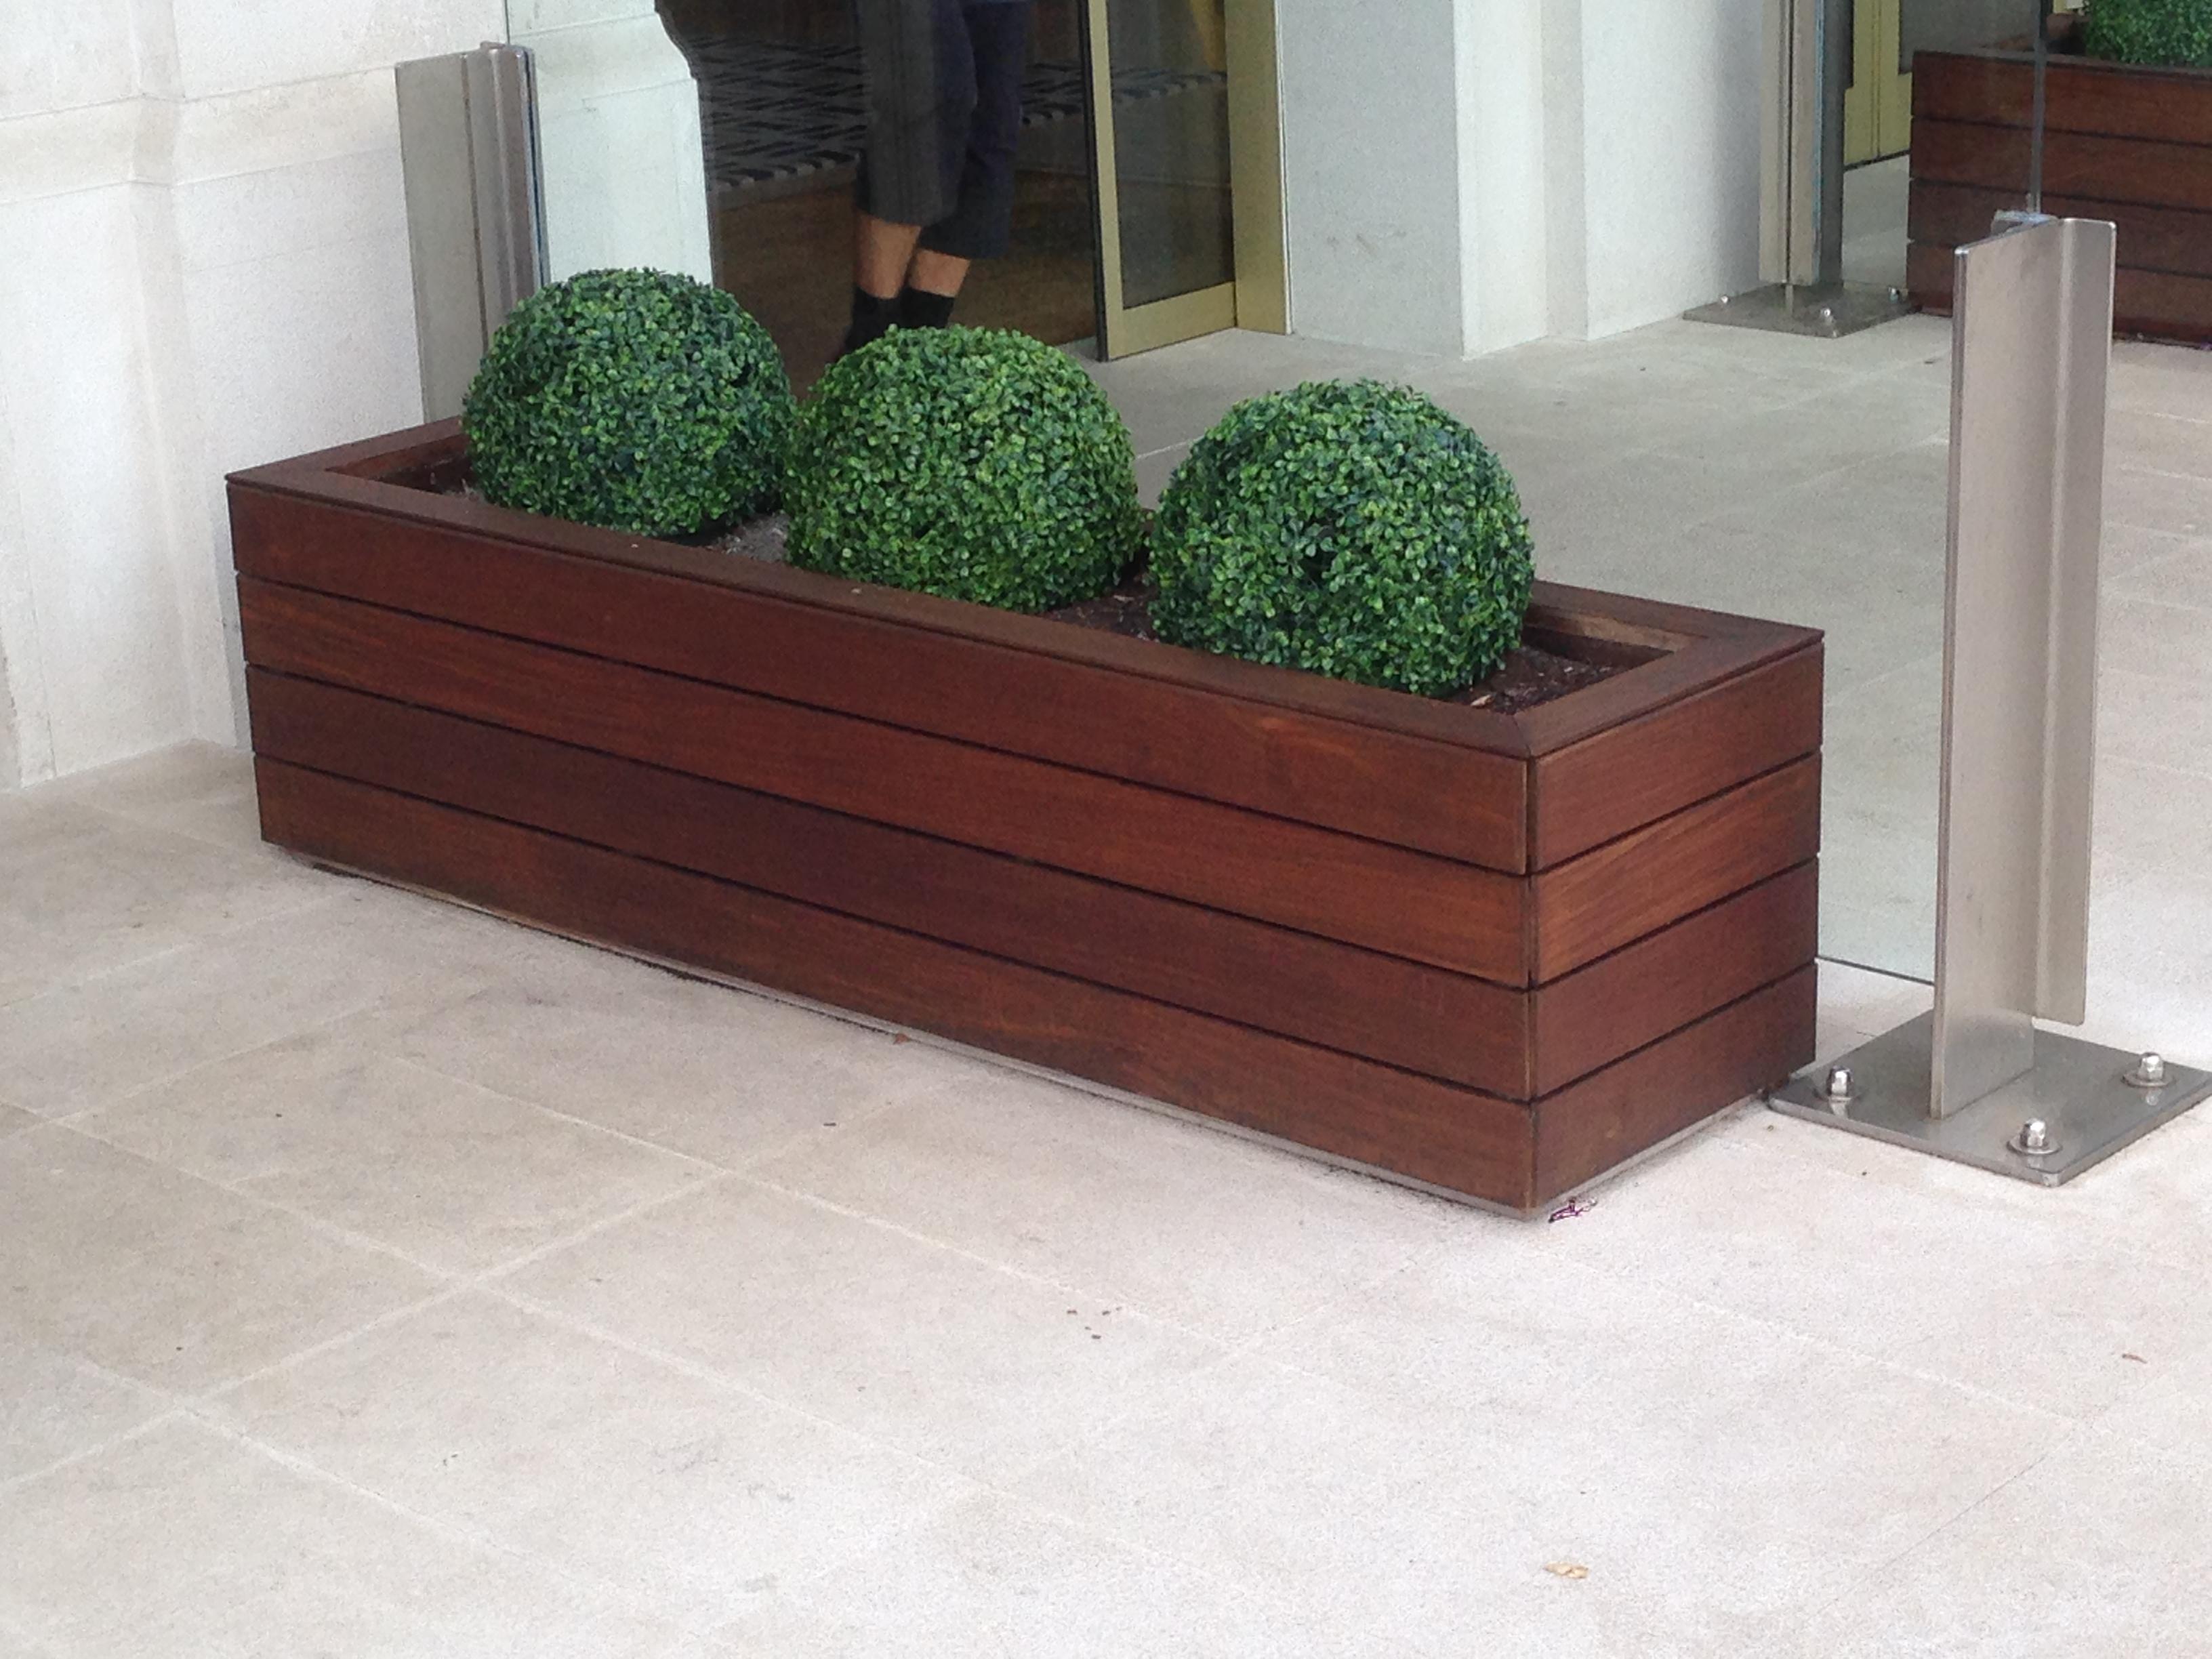 Madera tecnol gica decksystem y jardineras un t ndem - Jardineras de madera caseras ...